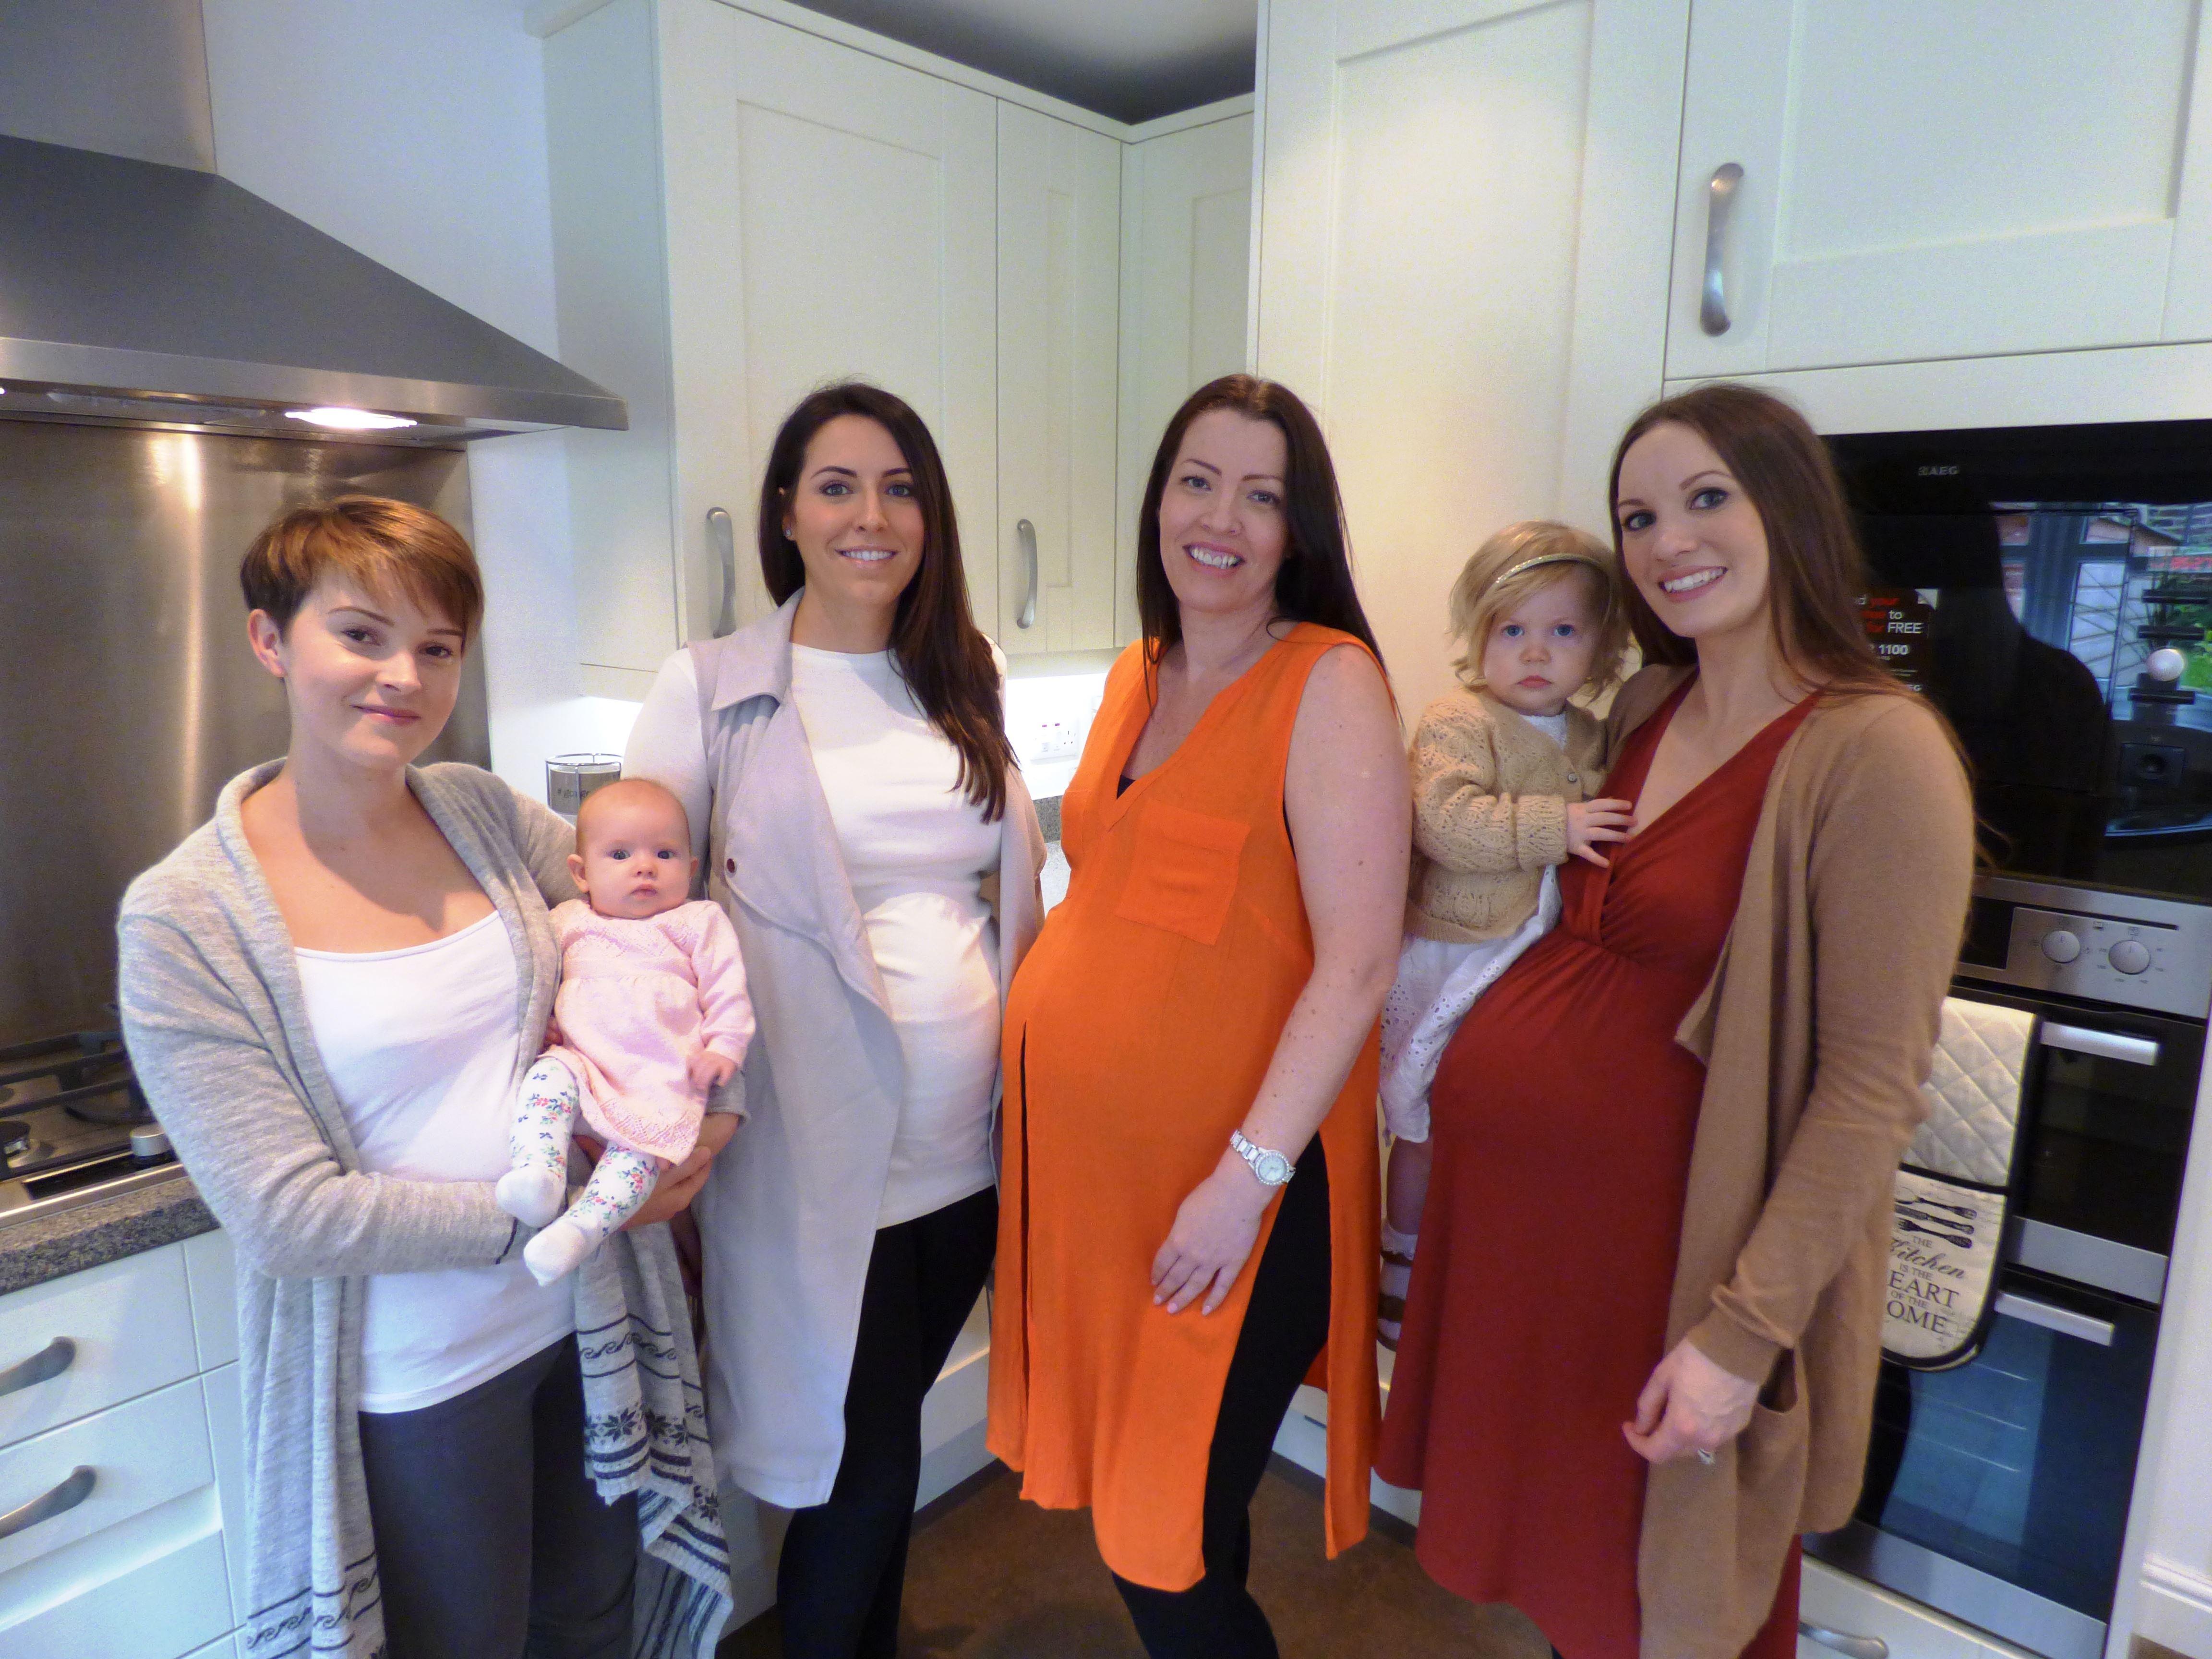 Poppy Jones with Ella Jones, Laura Charlton, Vicky Robinson, Marie-Claire Watson